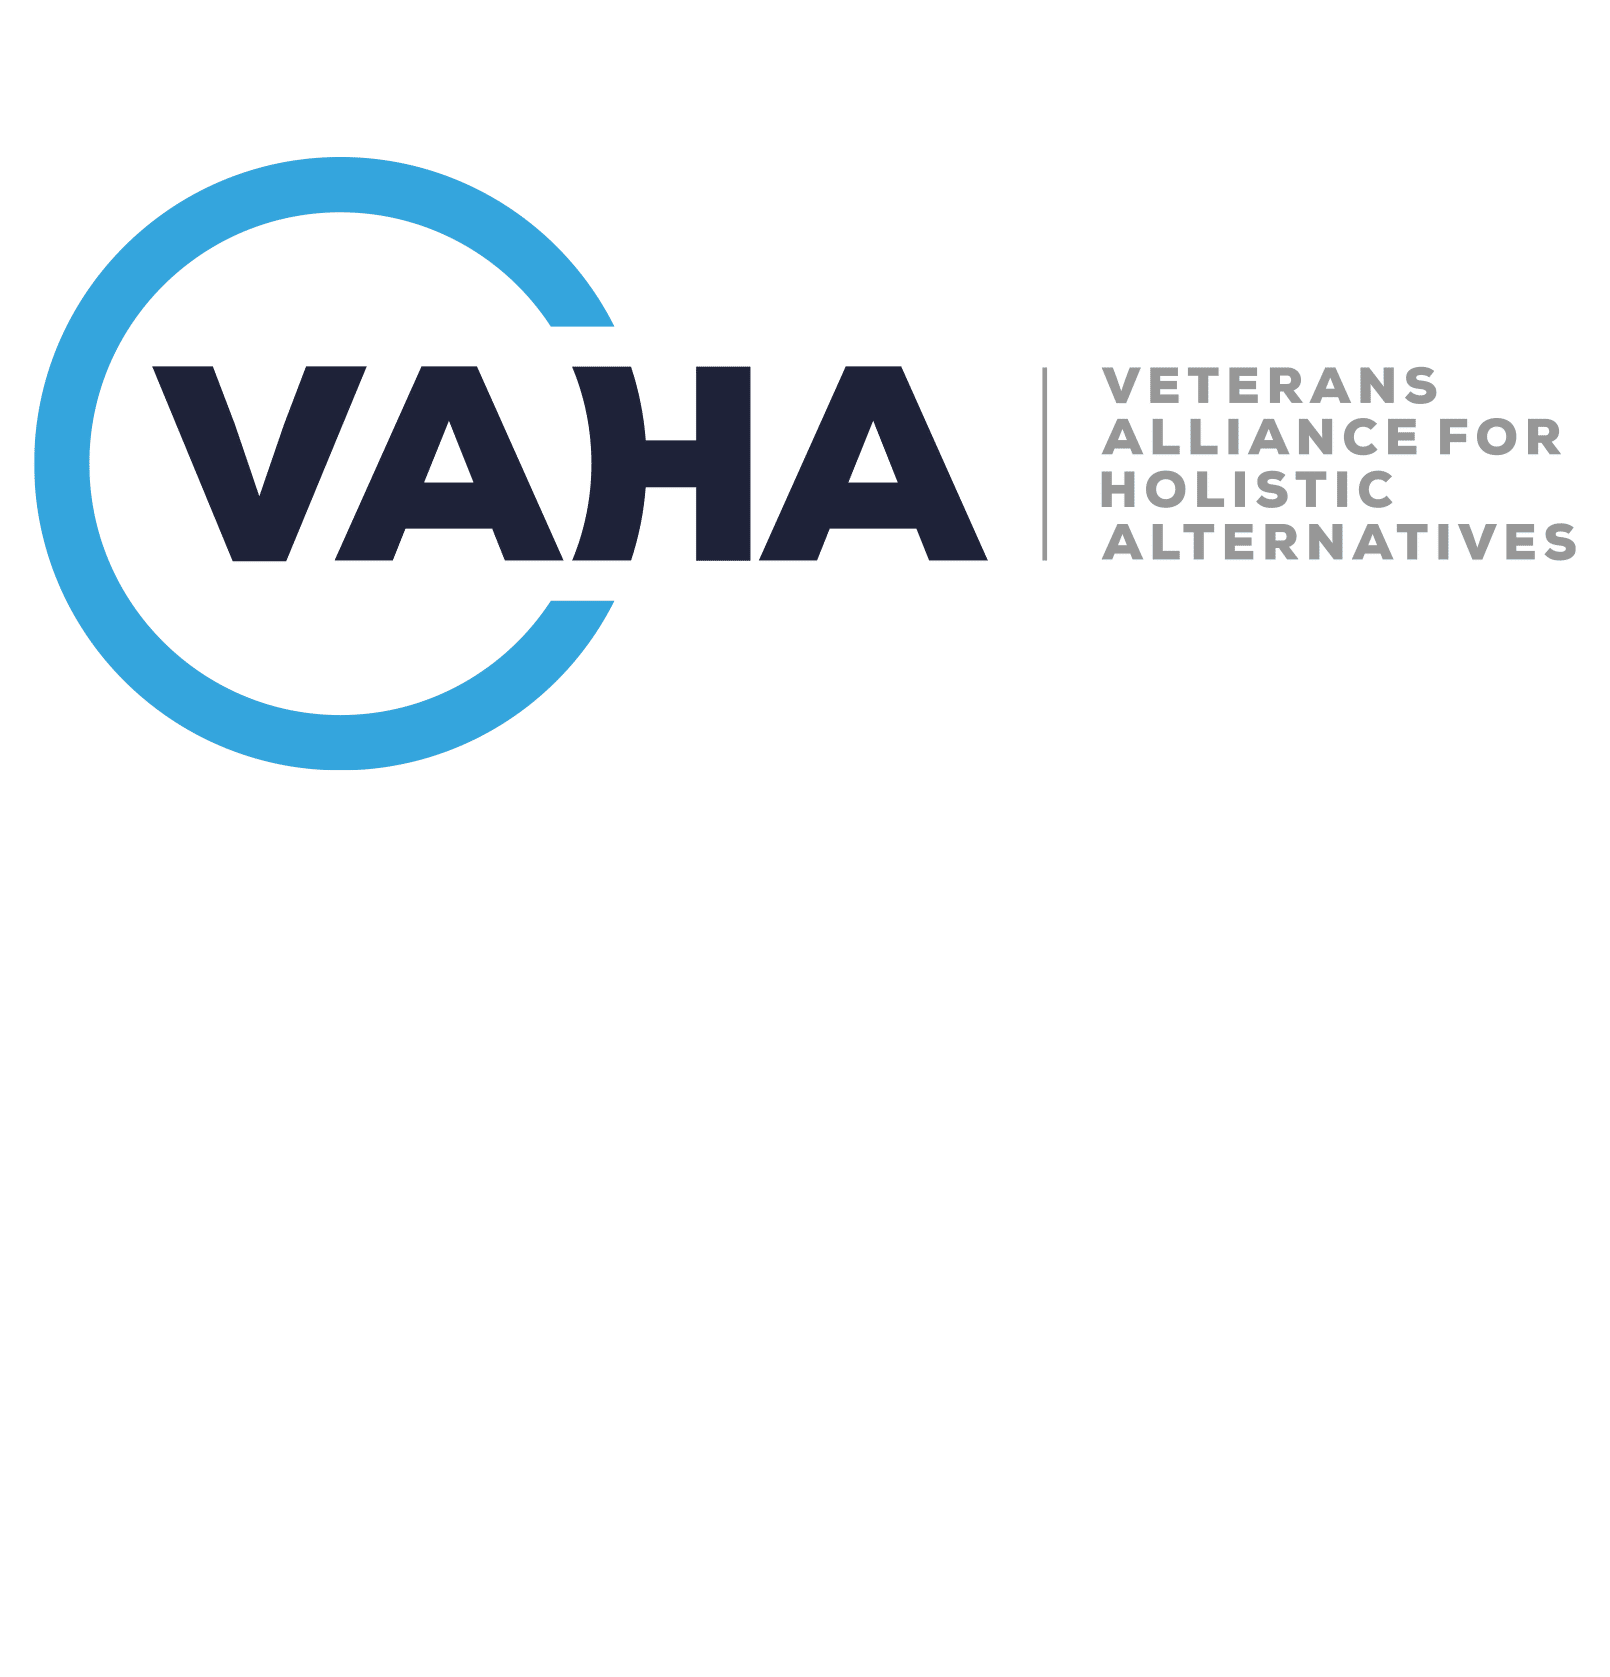 VAHA logo